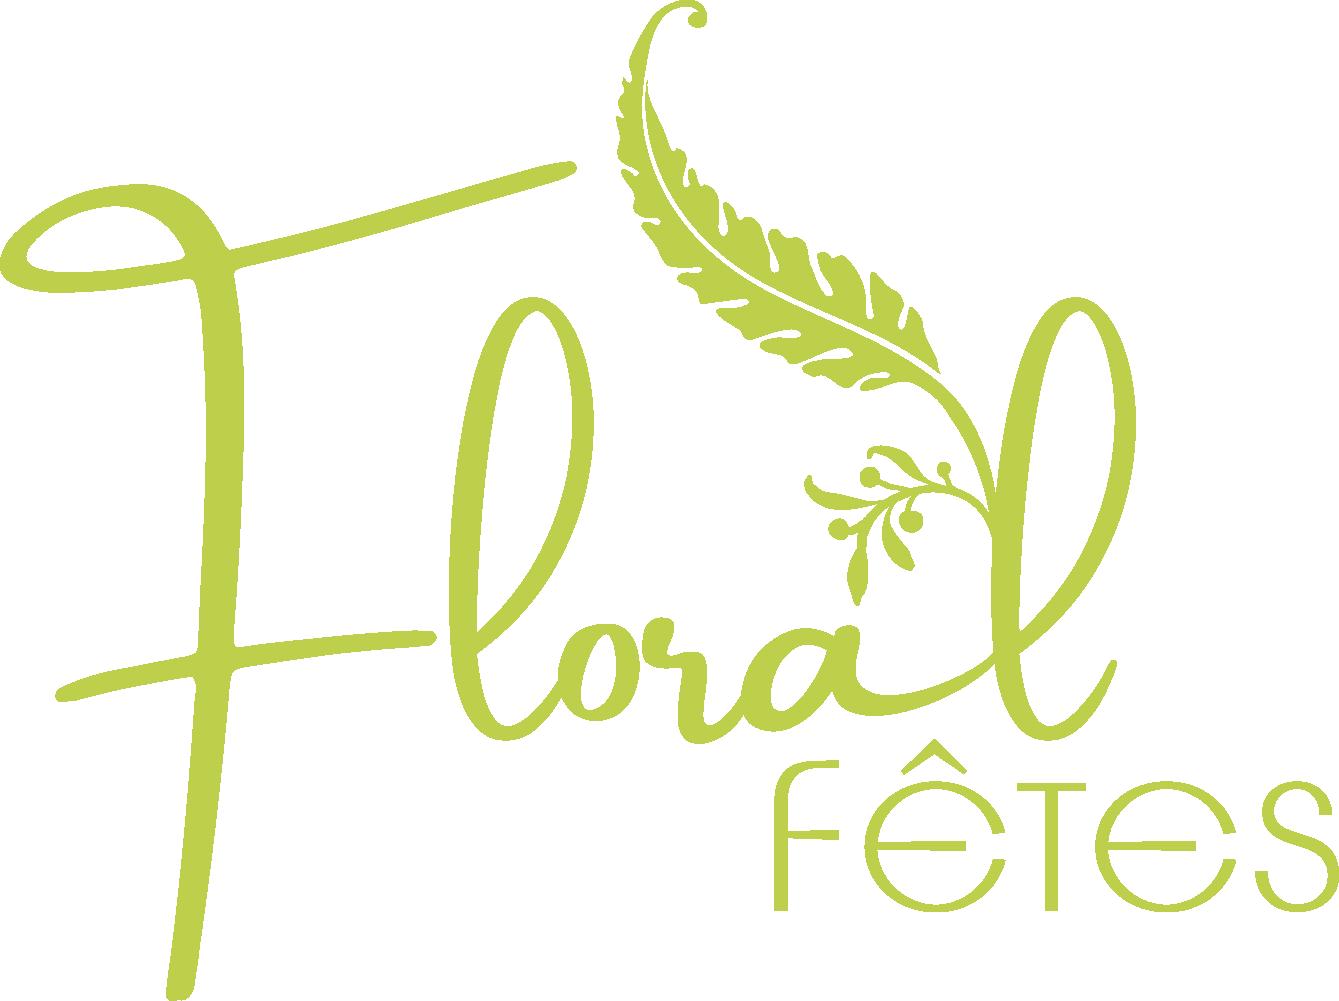 Floral Fetes logo to curves no frame.png